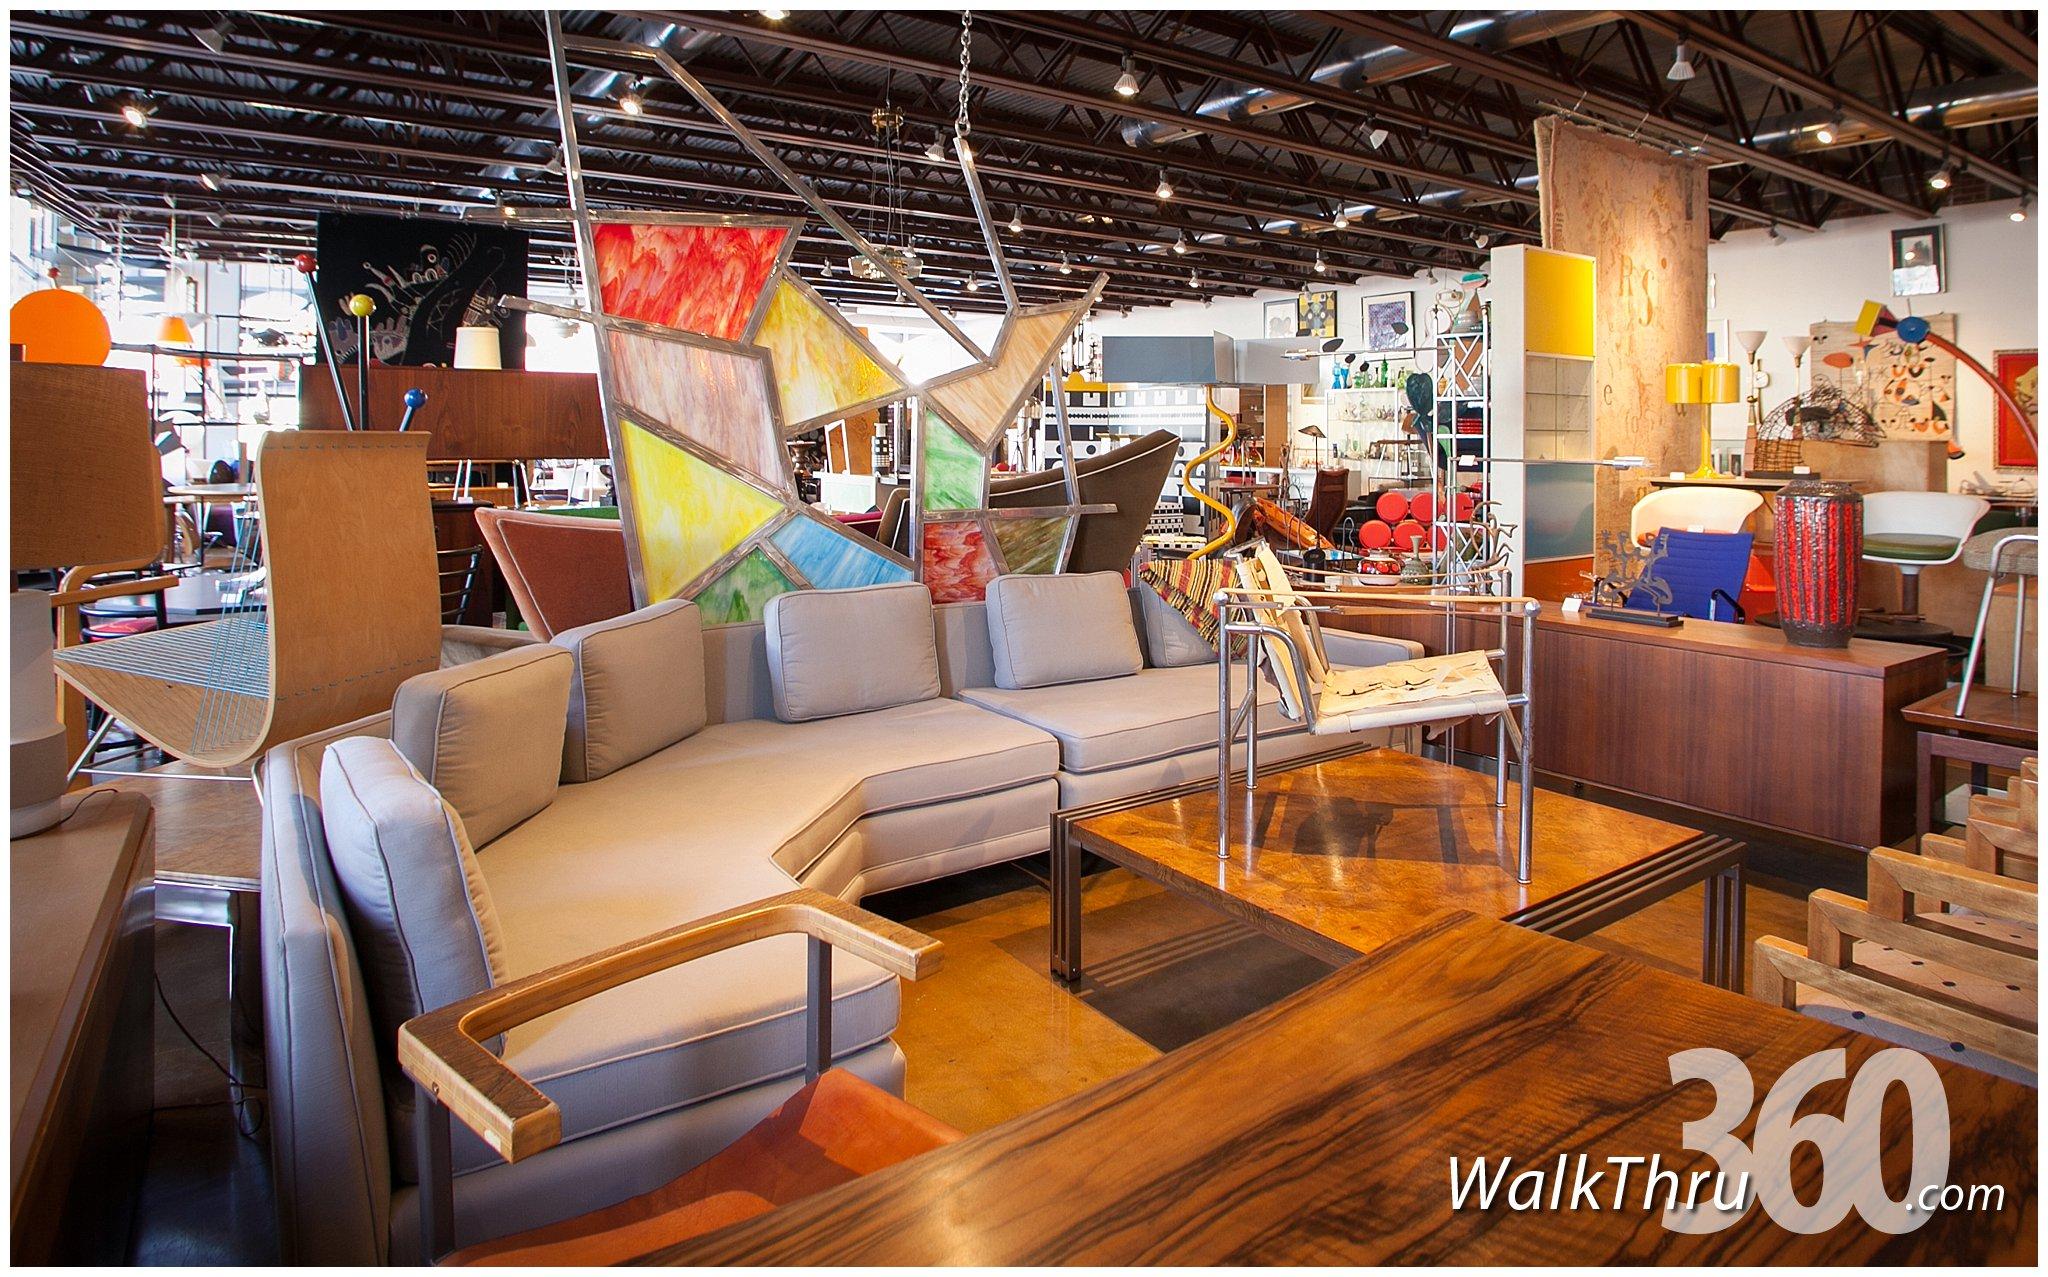 retro inferno furniture store kansas city street view virtual tour walkthru360 google 360. Black Bedroom Furniture Sets. Home Design Ideas